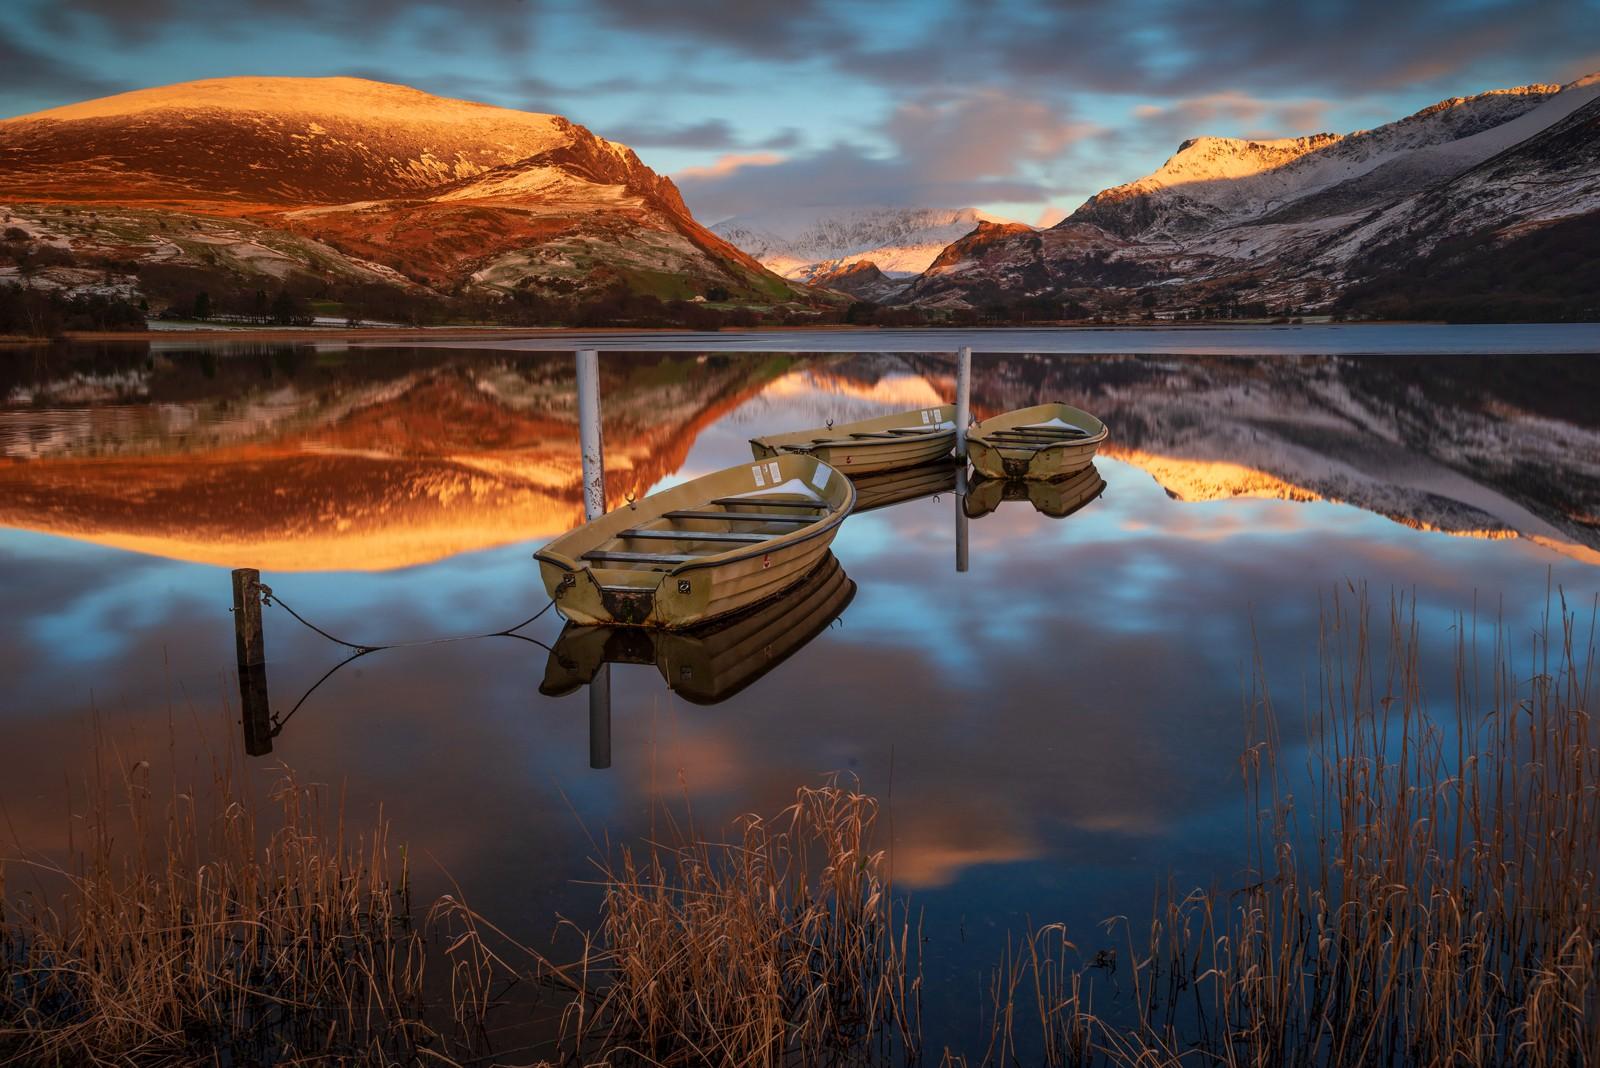 Llyn Nantlle Uchaf Snowdonia Wales/canvas prints for sale